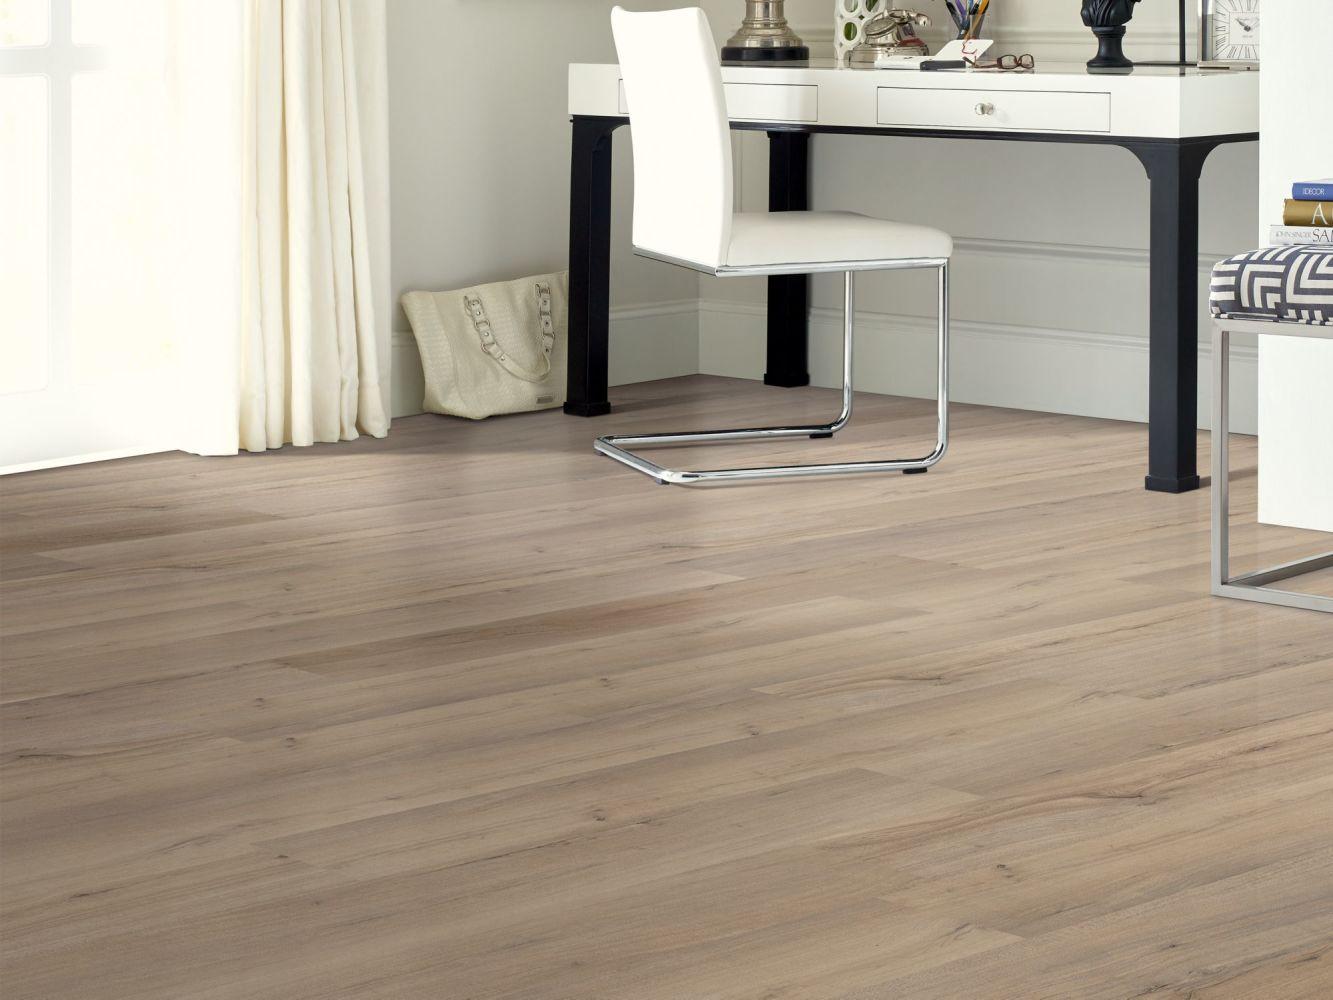 Shaw Floors Resilient Property Solutions Optimum 512c Plus Driftwood 01056_VE210